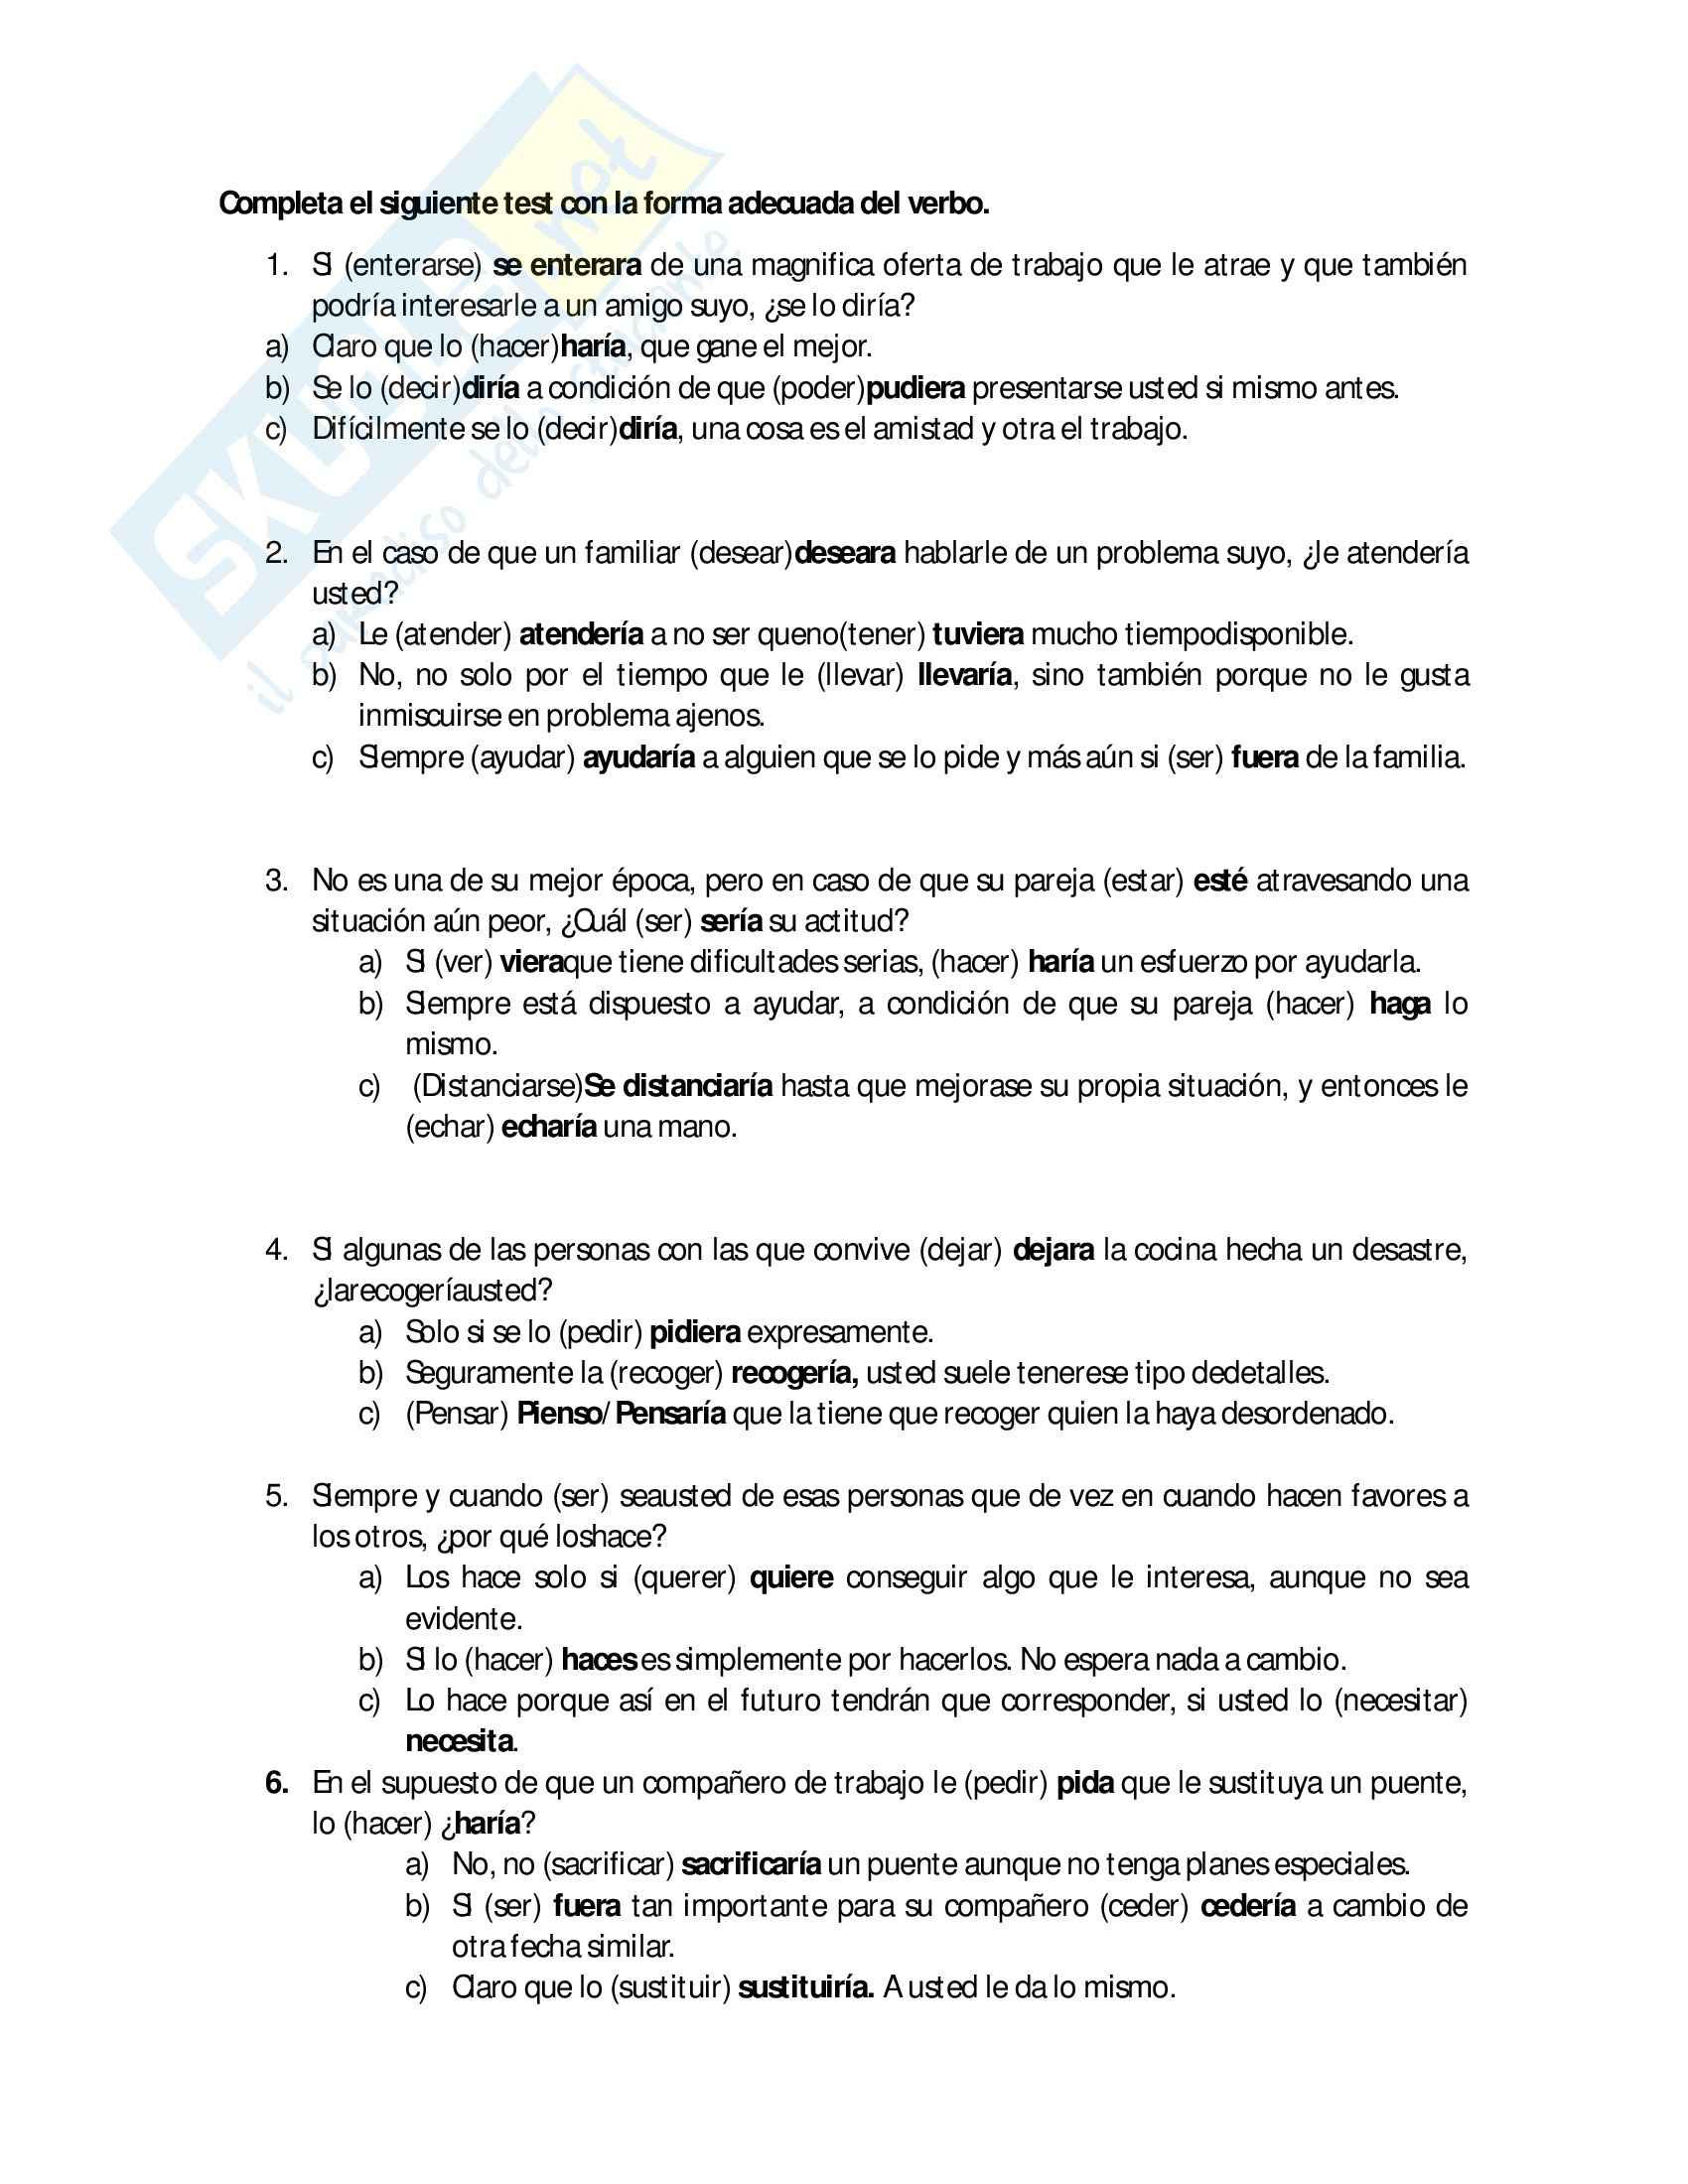 Lingua spagnola 2 - Esercizio